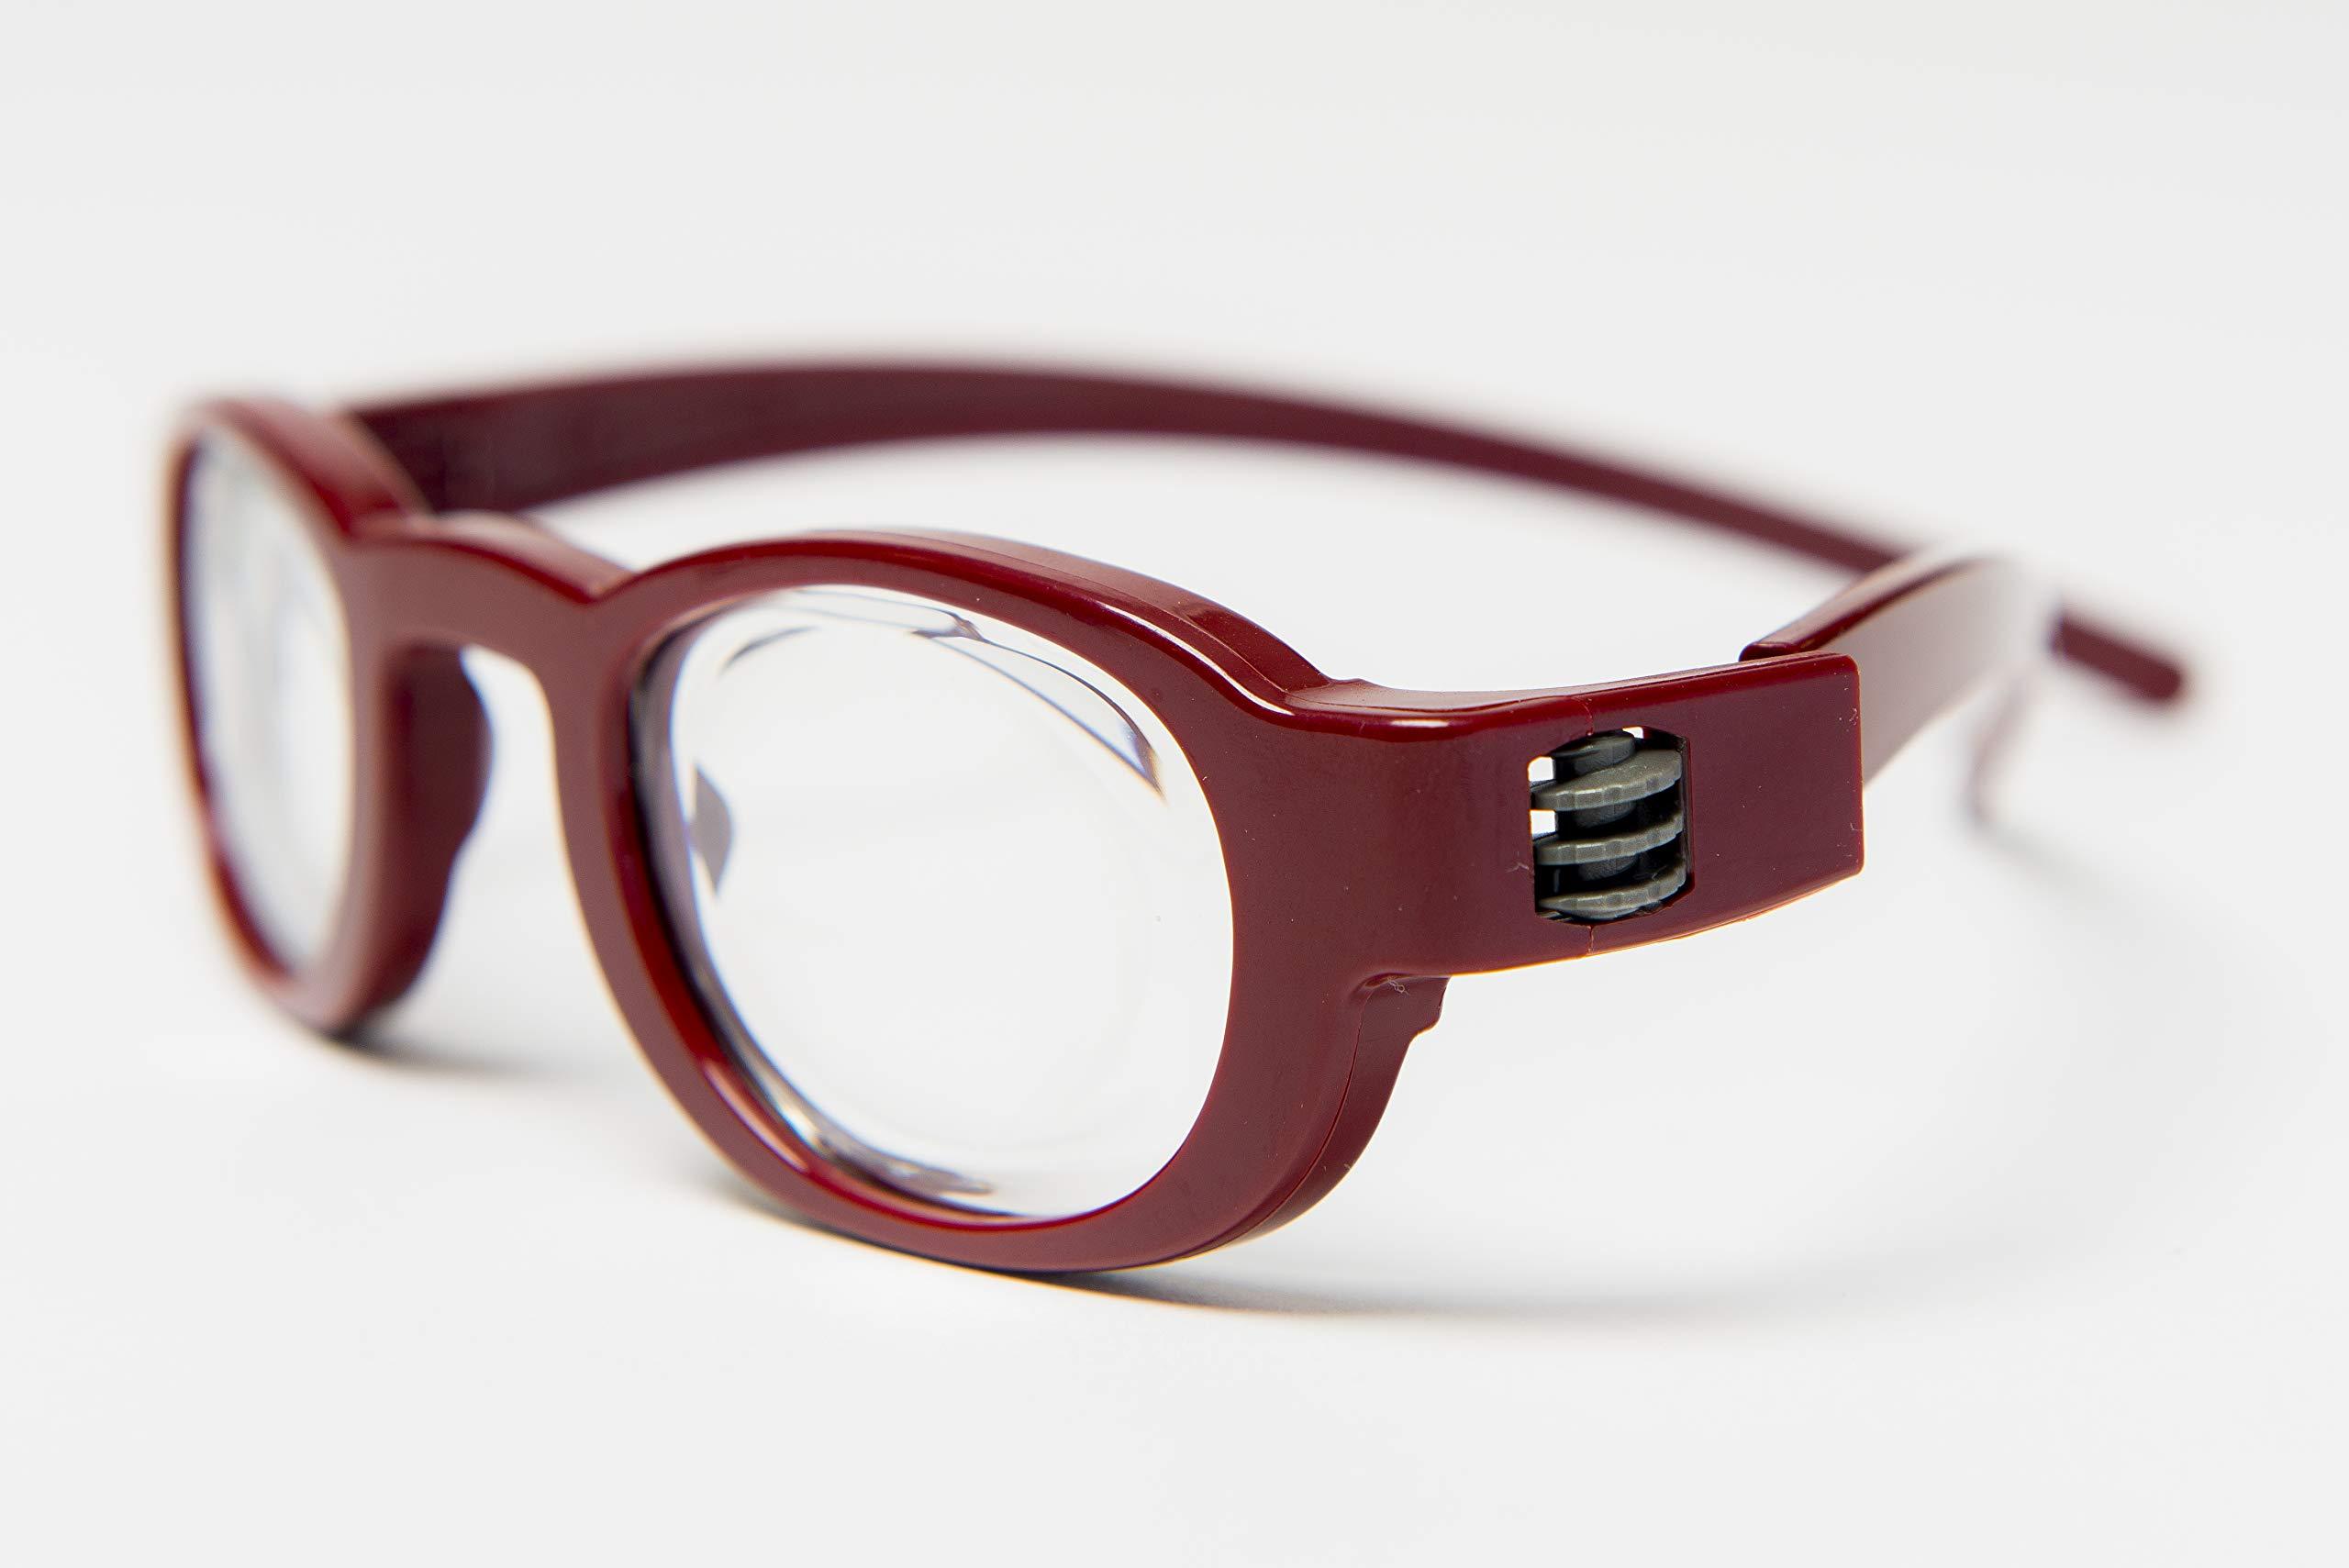 Focus Specs Self Adjusting Red Reading Glasses (+0.5 to +4.5)